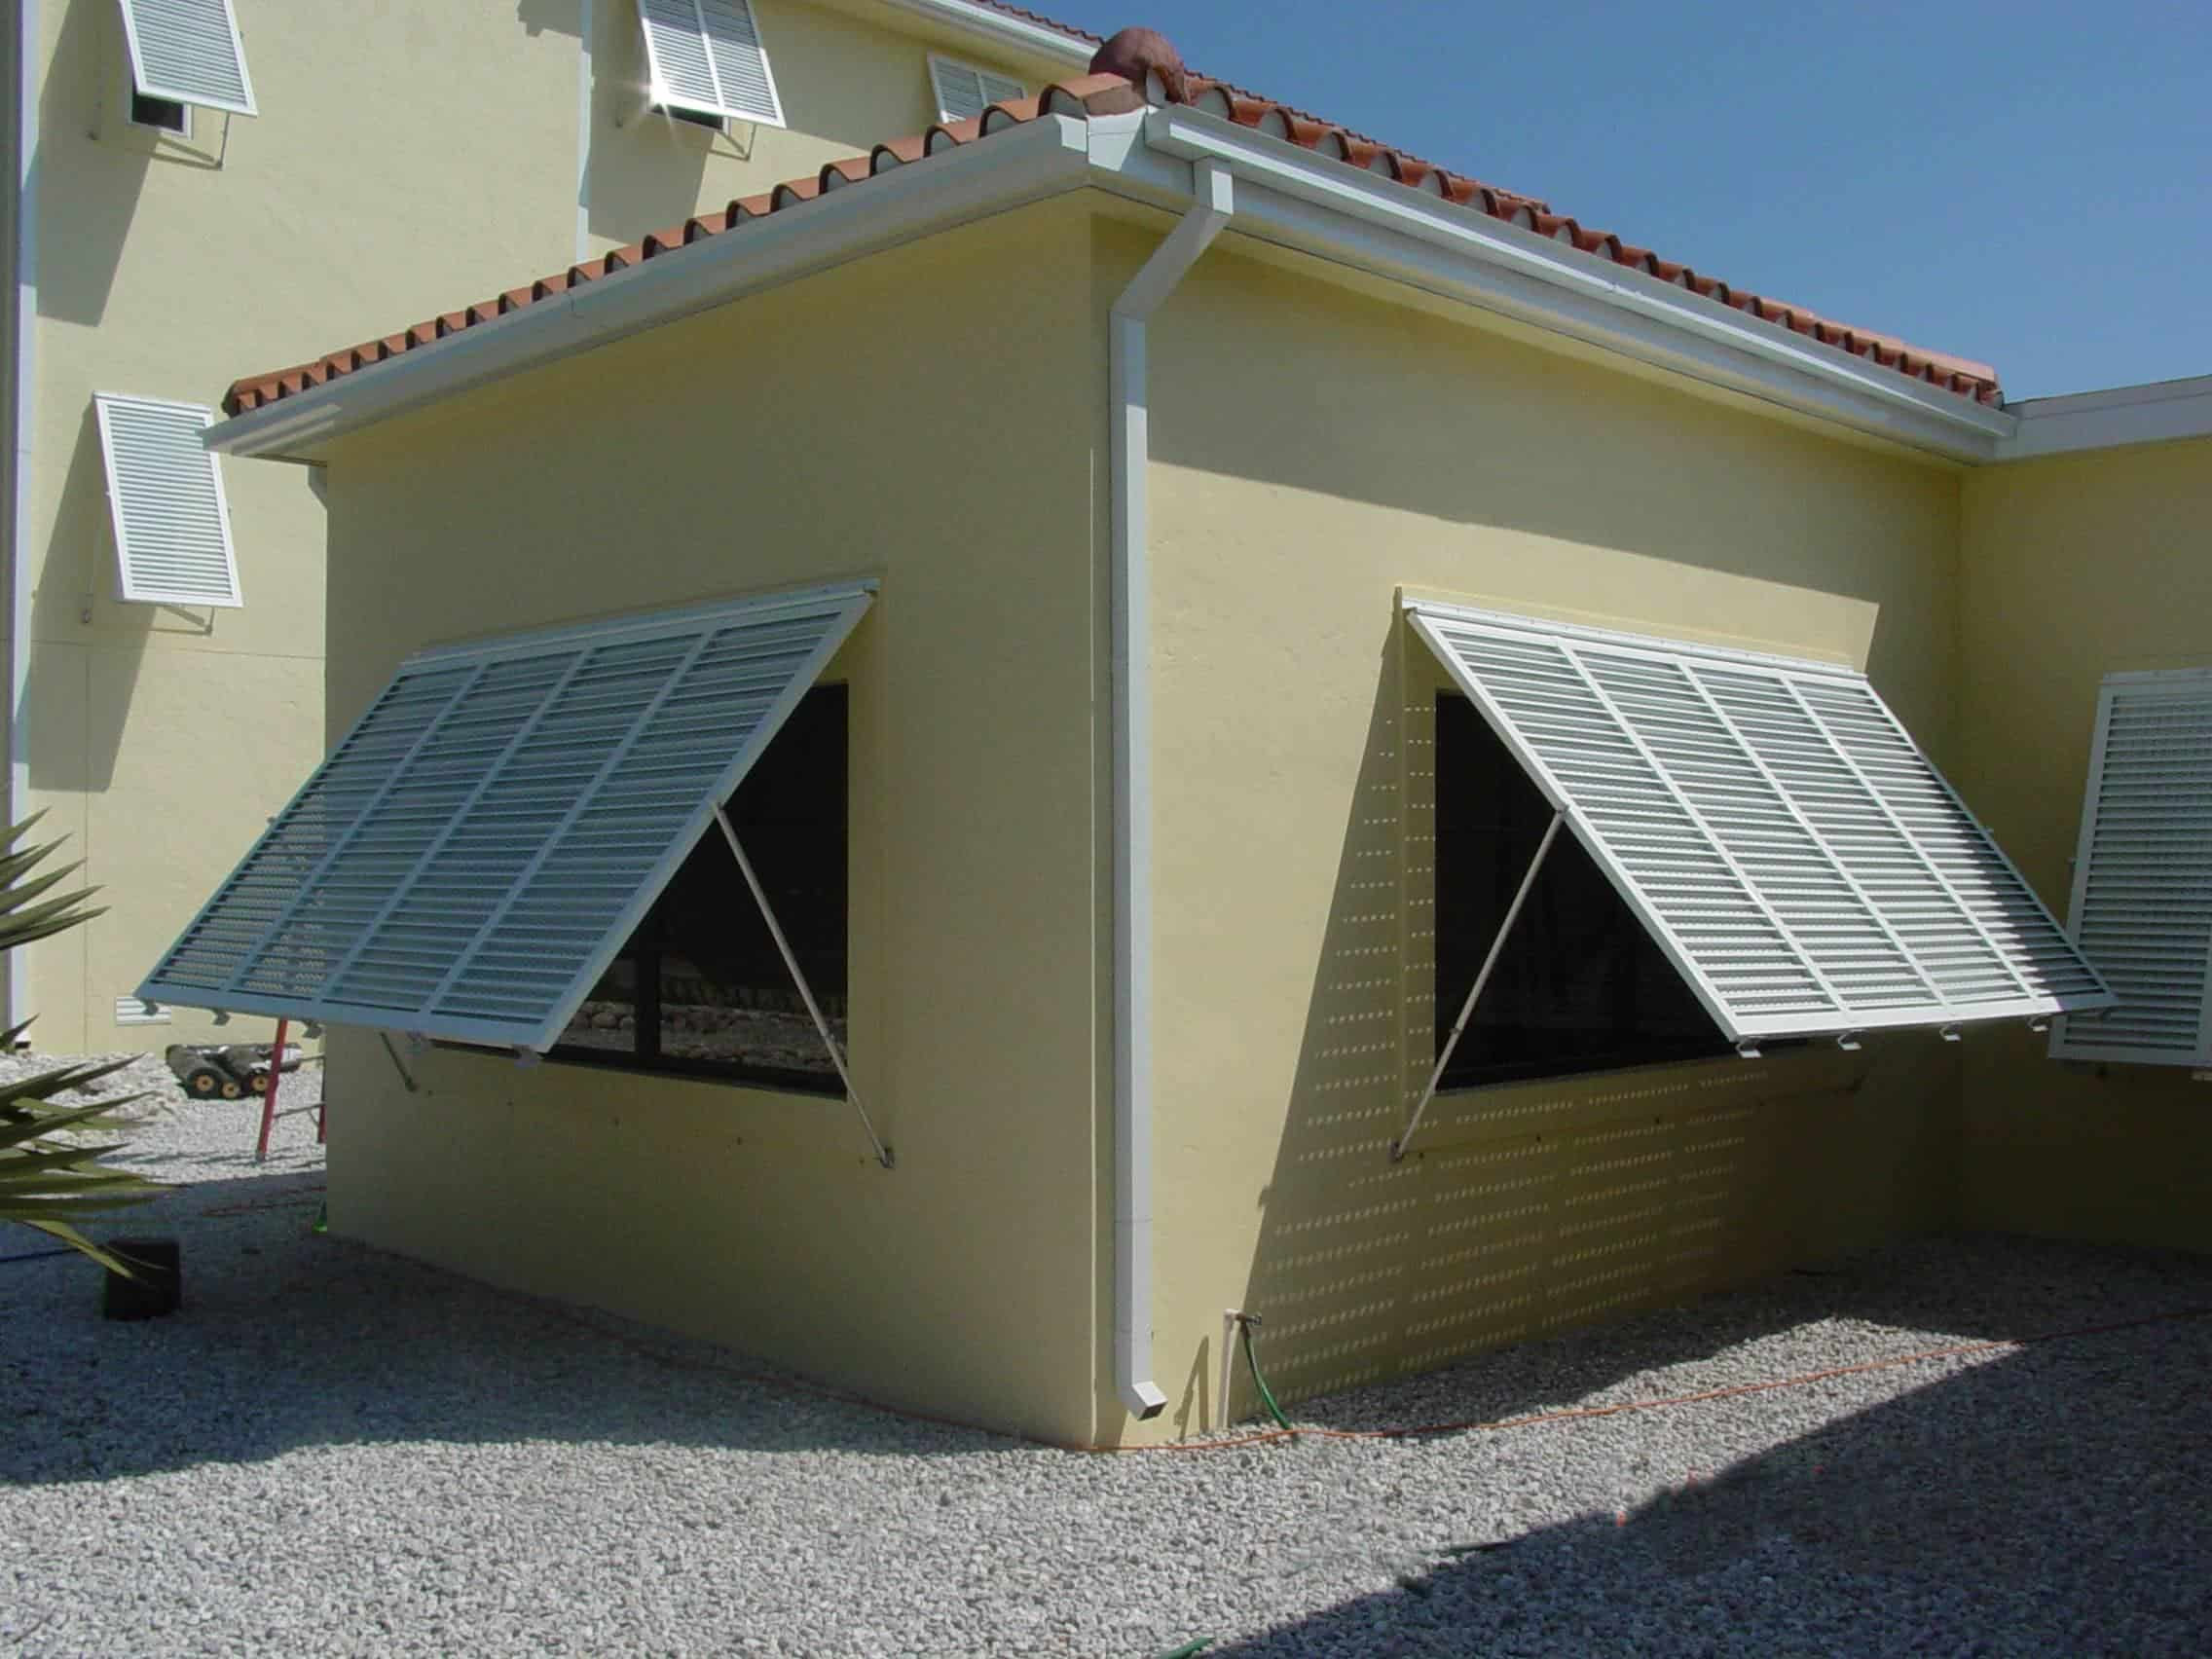 open PTX Bahama Shutters on yellow house